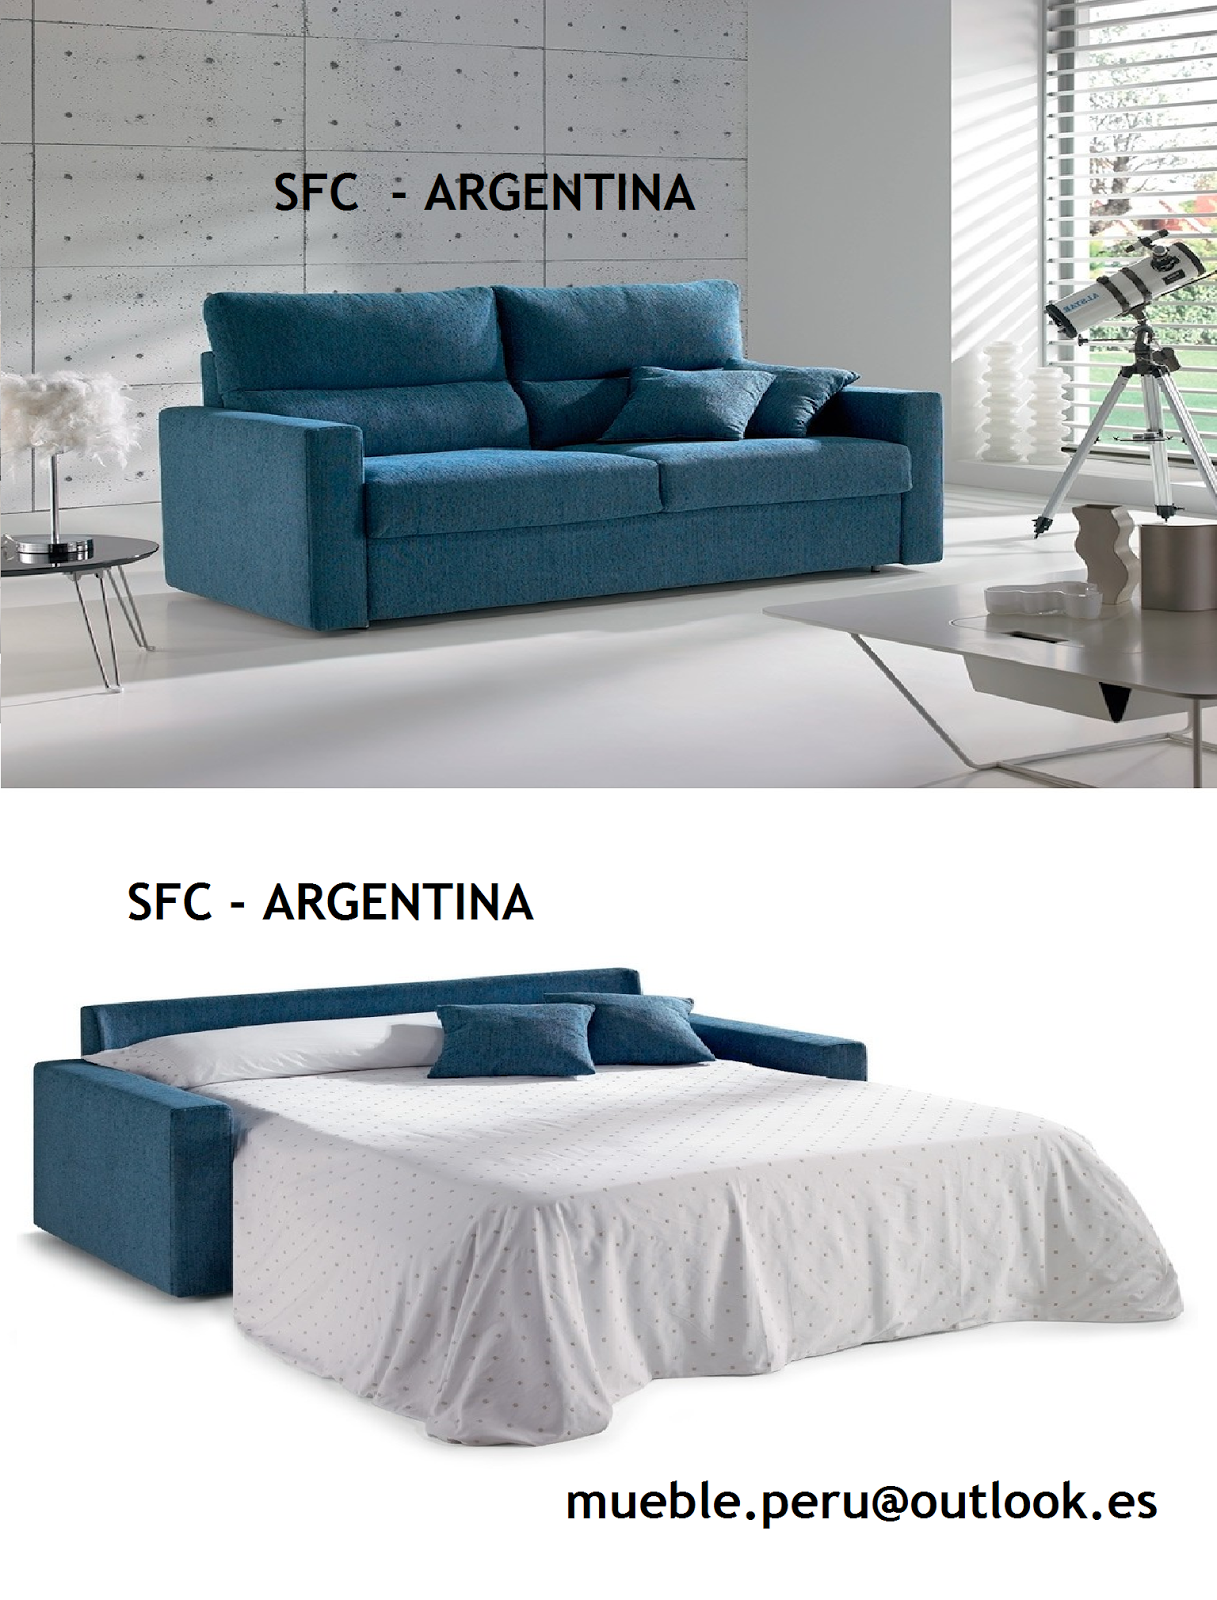 Sofa Sfc Comfortable Sleeper Bed Mueble Peru Sakuray Cama Americano Argentina